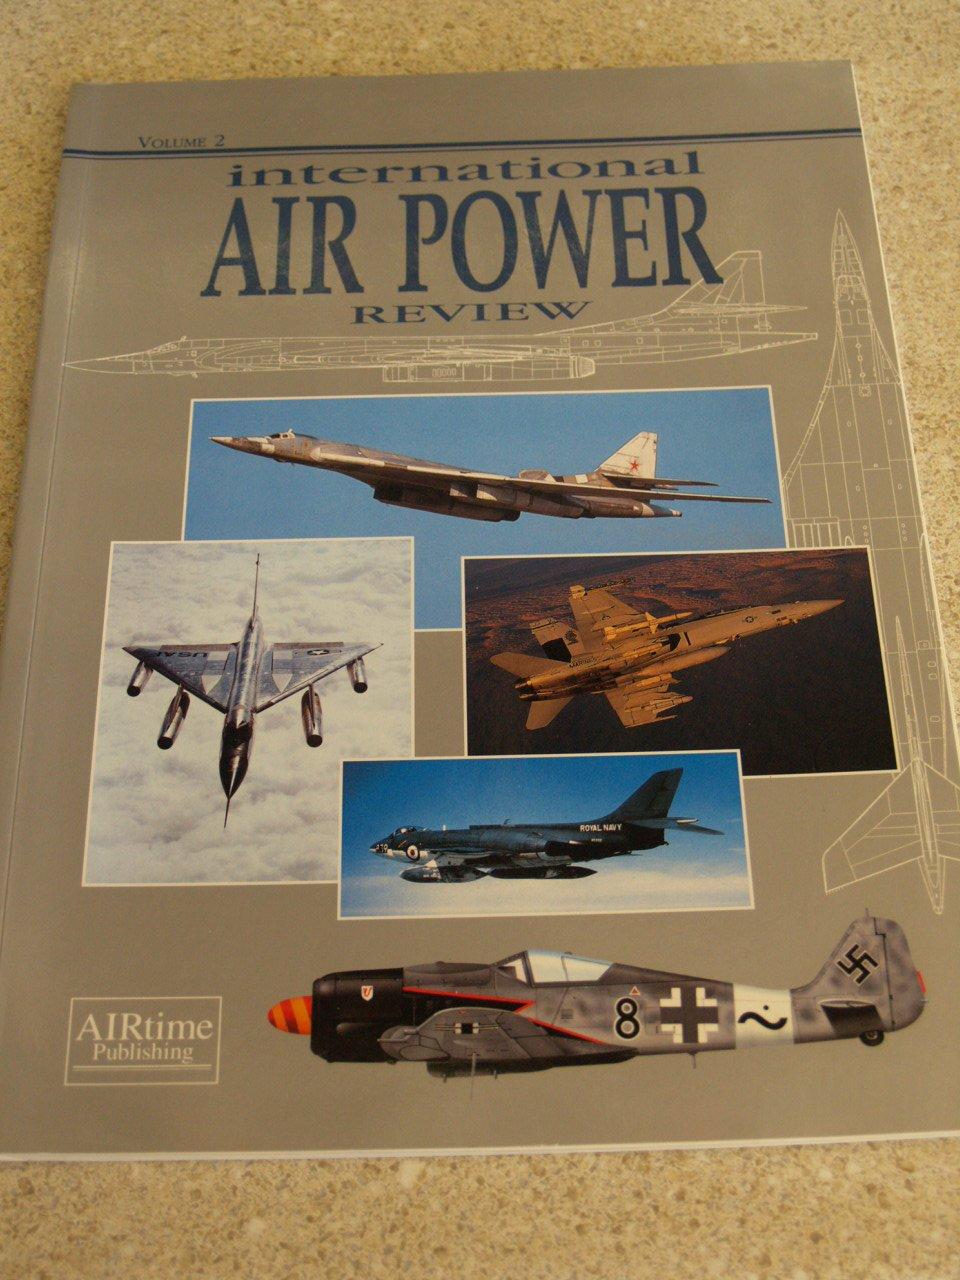 International Air Power Review, Vol. 2